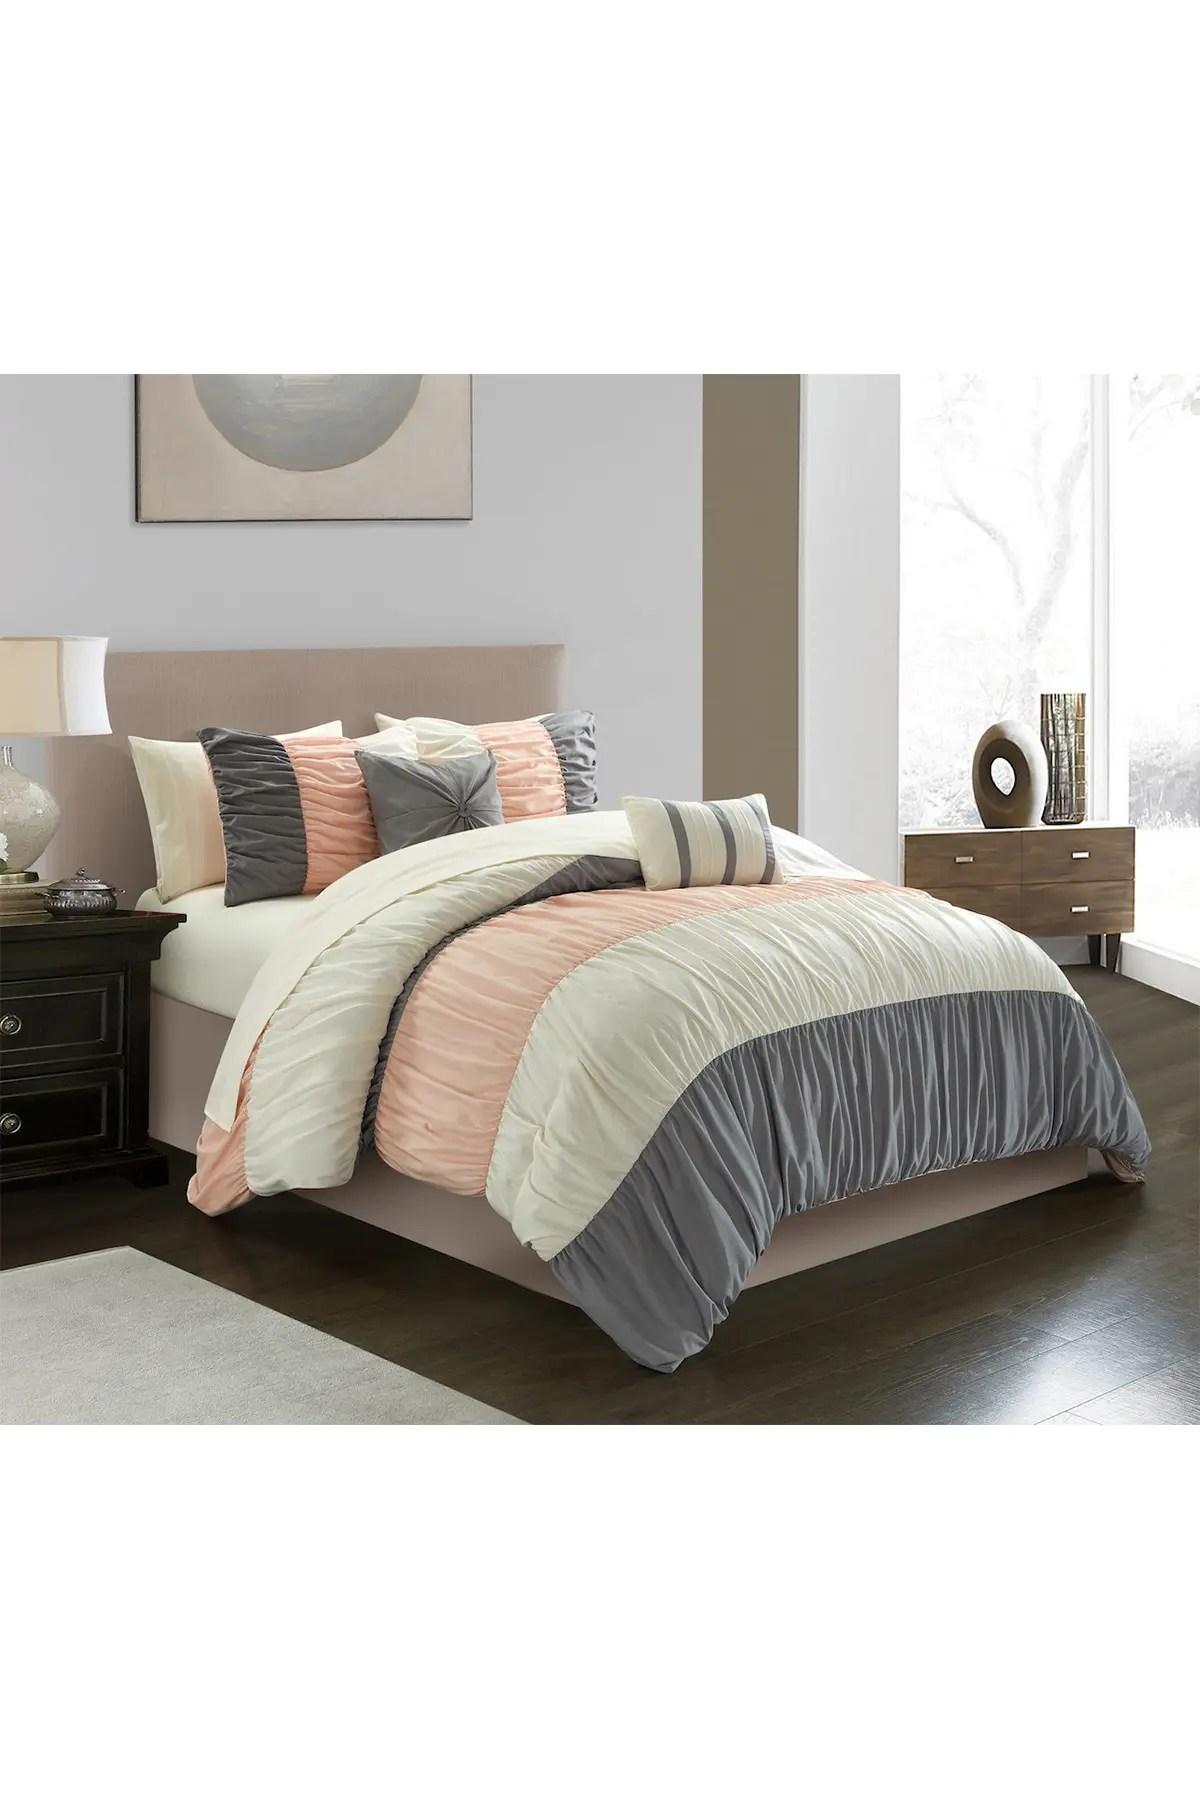 chic home bedding jaye ruched color block design queen comforter set blush 9 piece set nordstrom rack